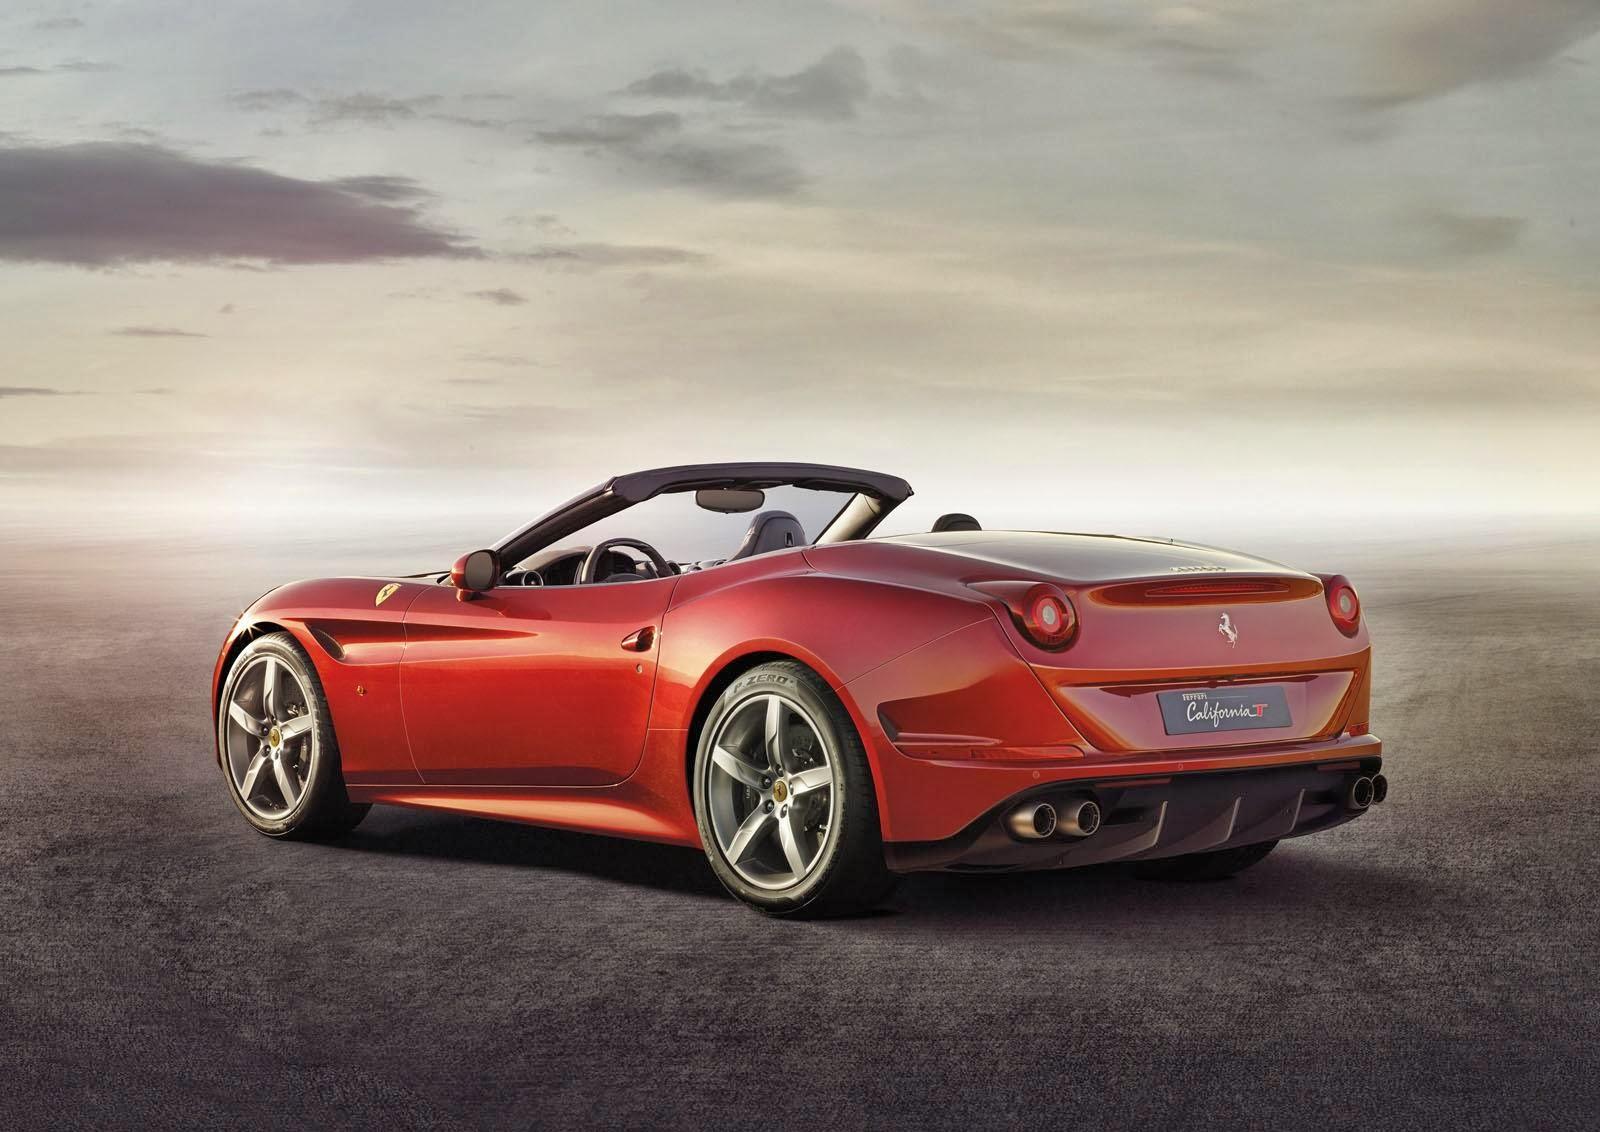 [Resim: Ferrari+California+T+2.jpg]